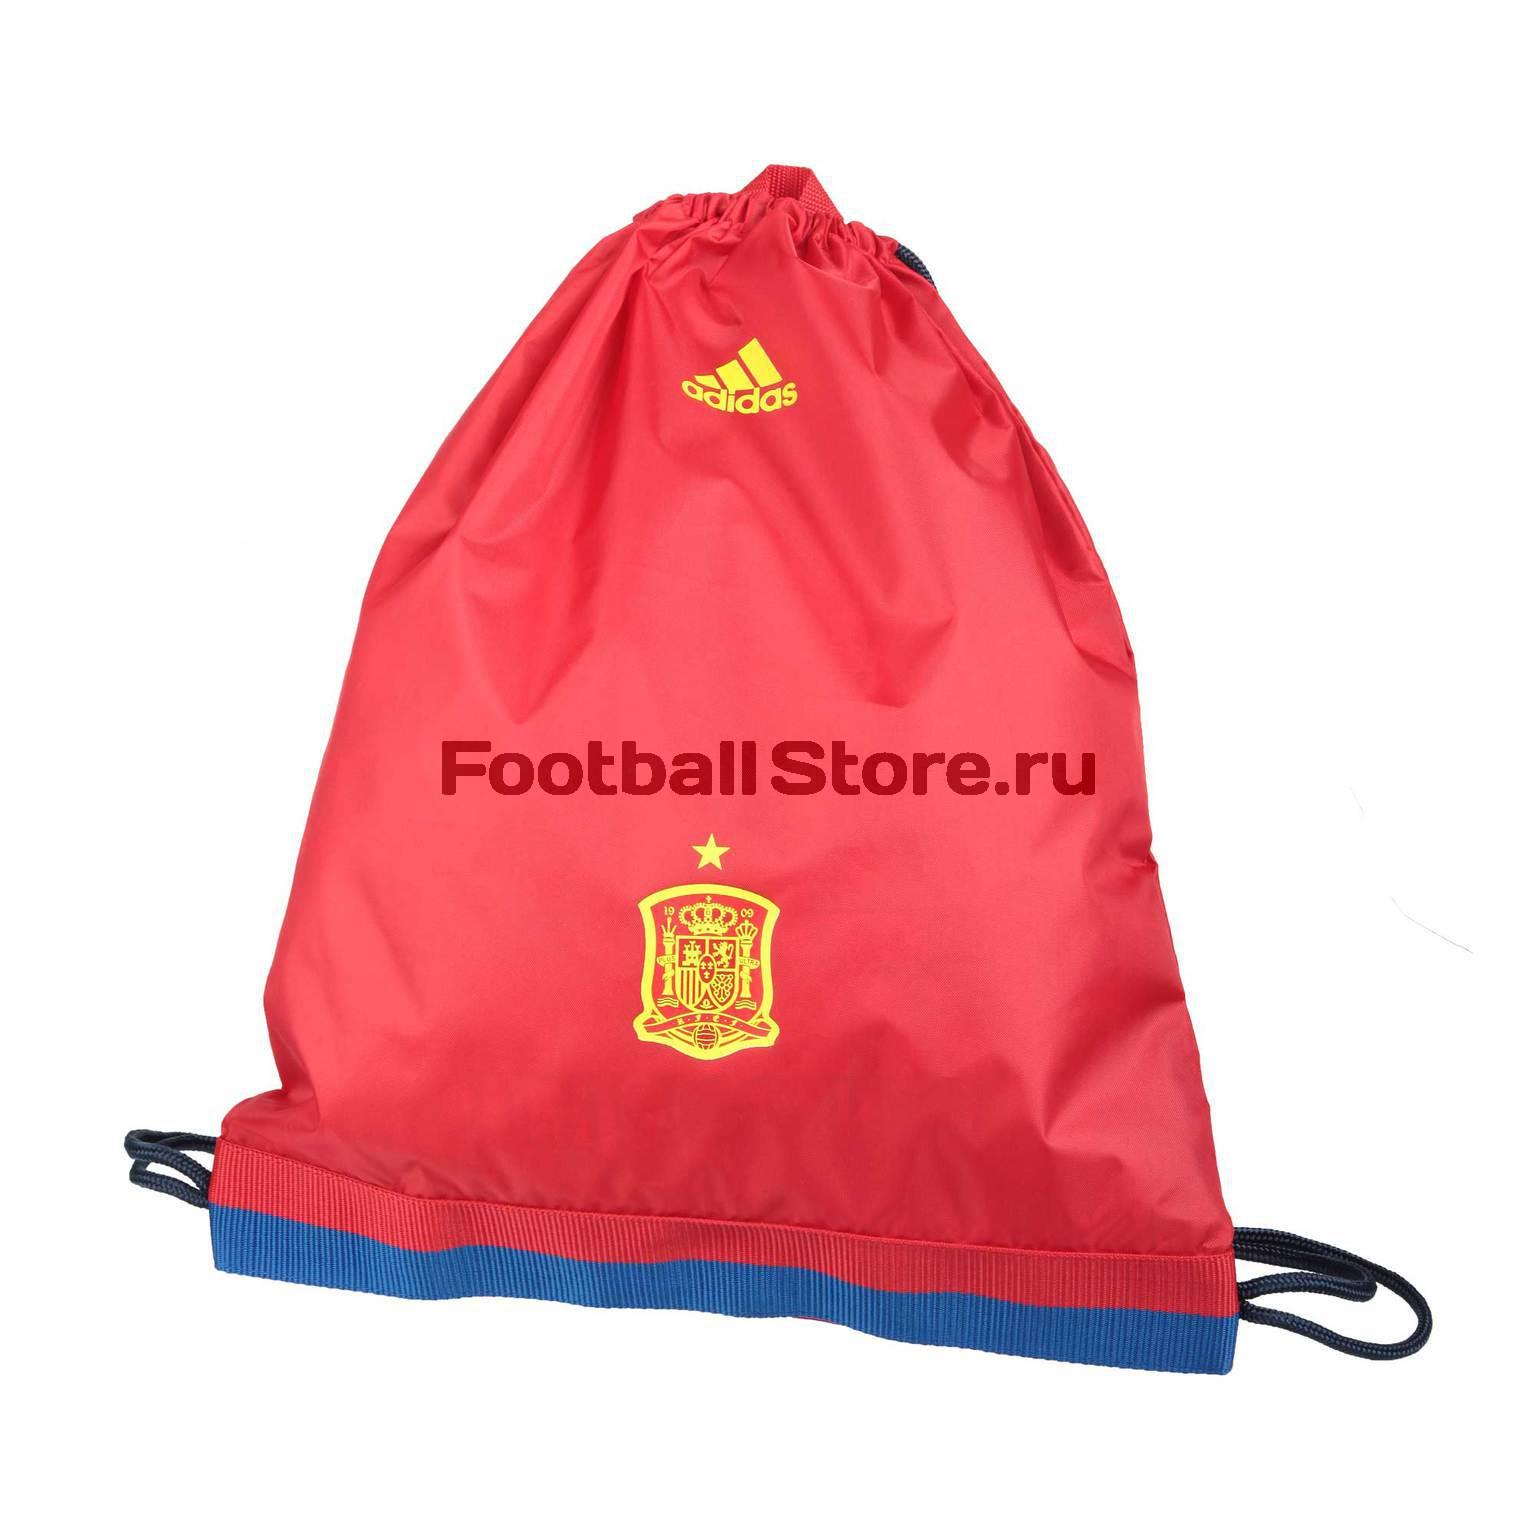 Сумка для обвуи Adidas Spain GB AI4846